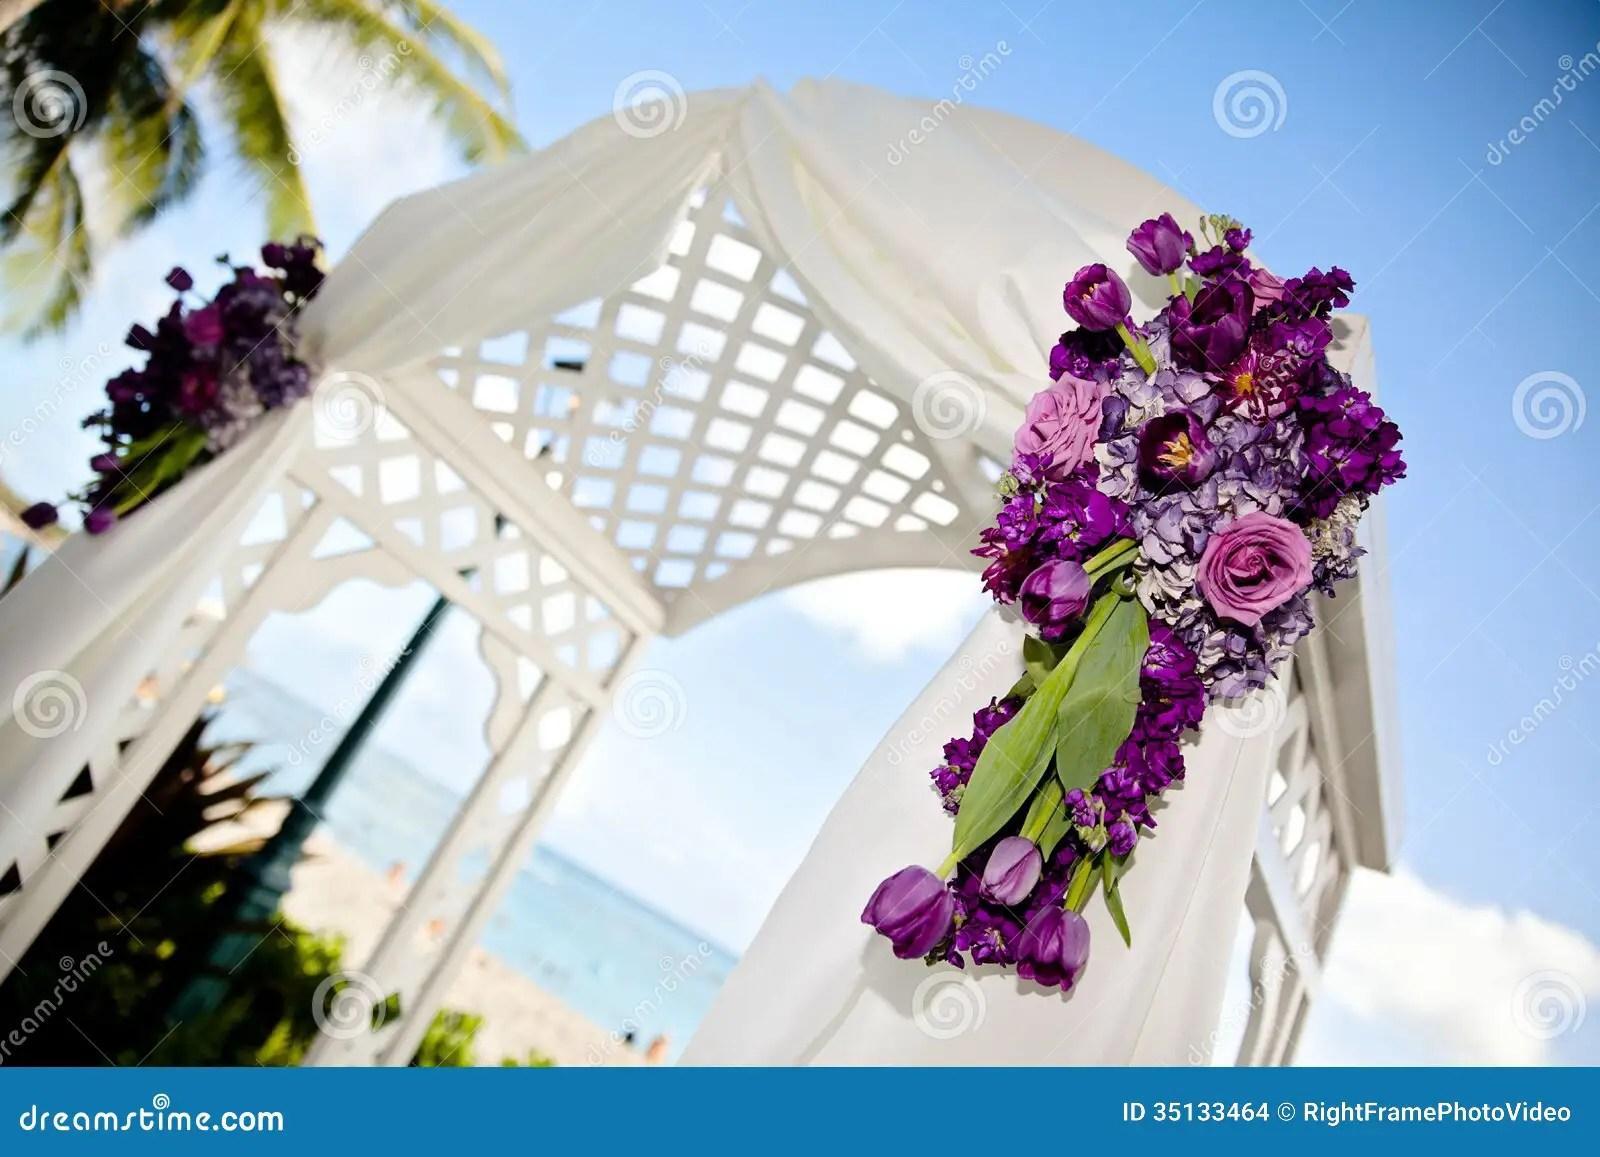 Wedding Arch Stock Photo Image Of Love Hydrangeas